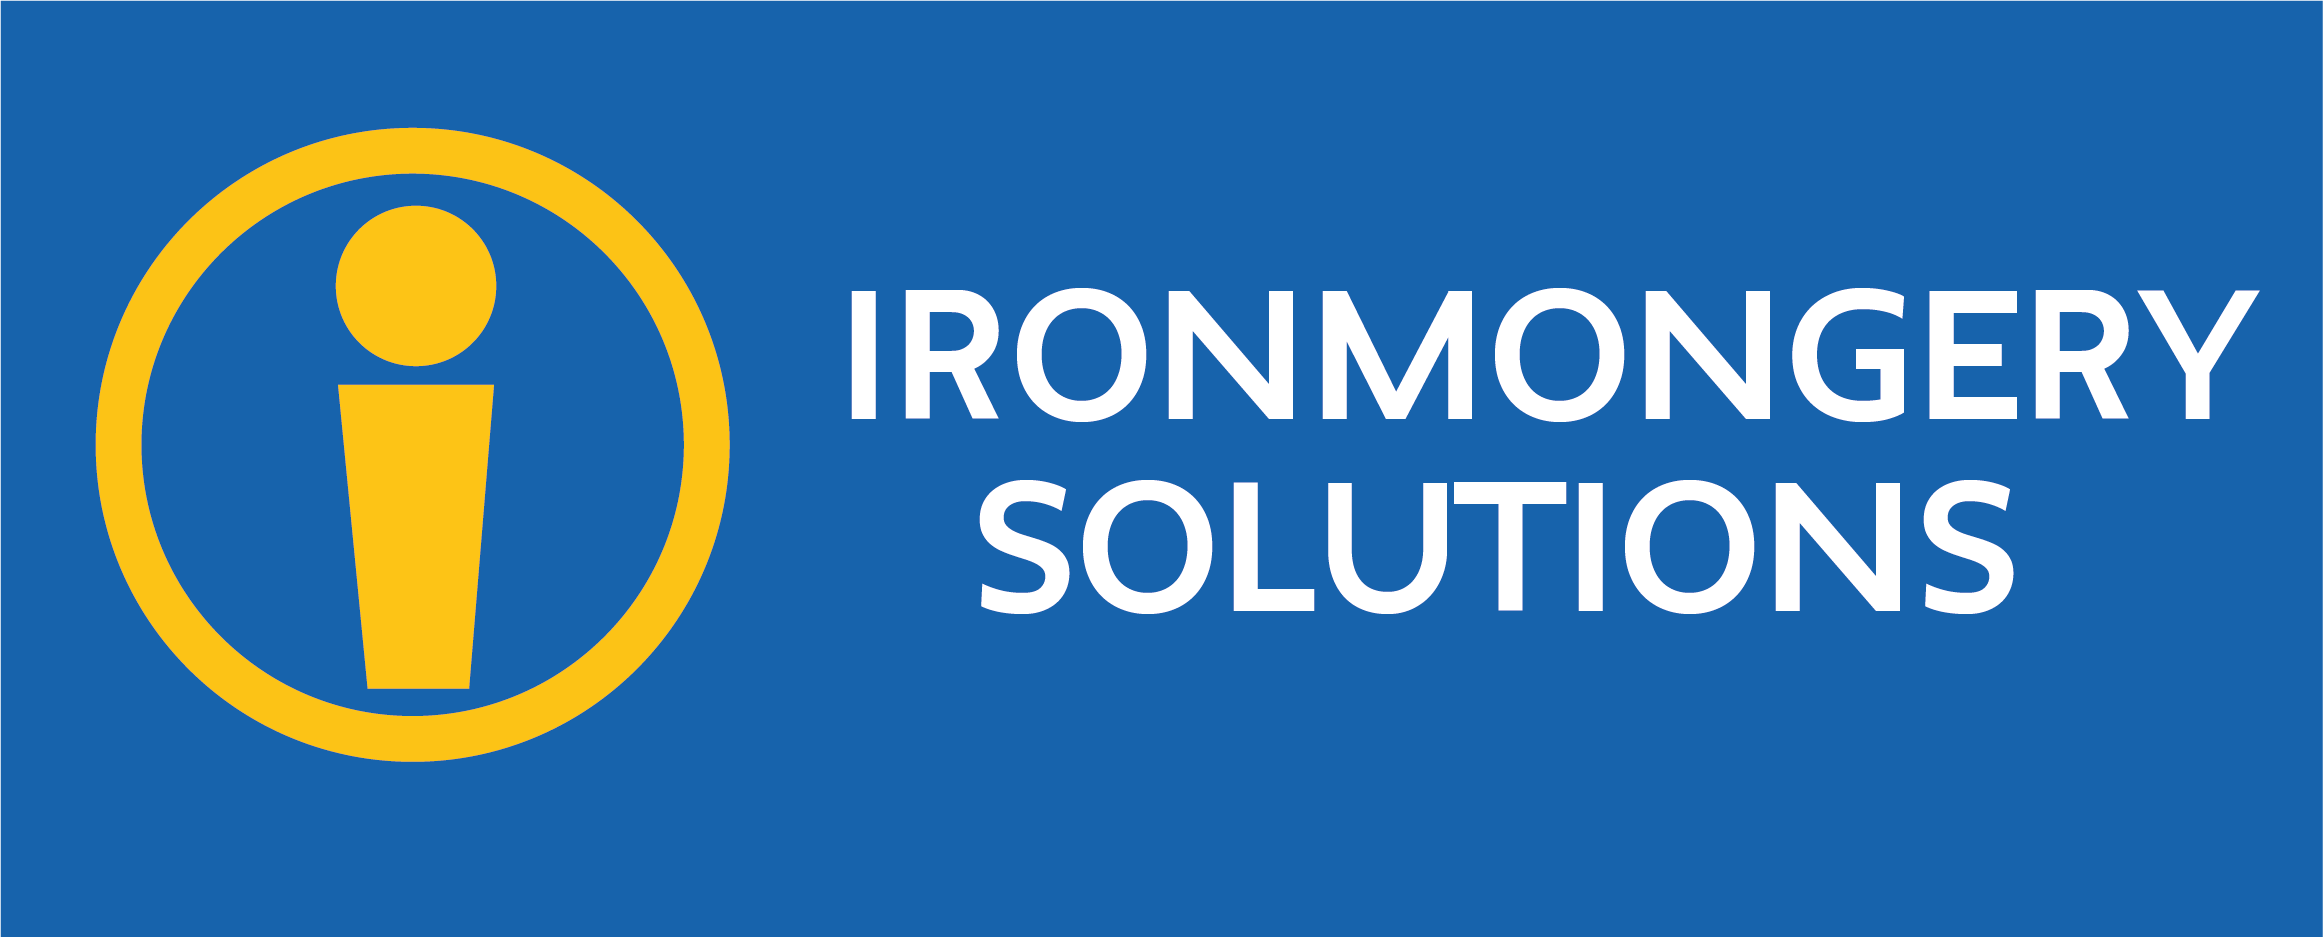 Ironmongery Solutions